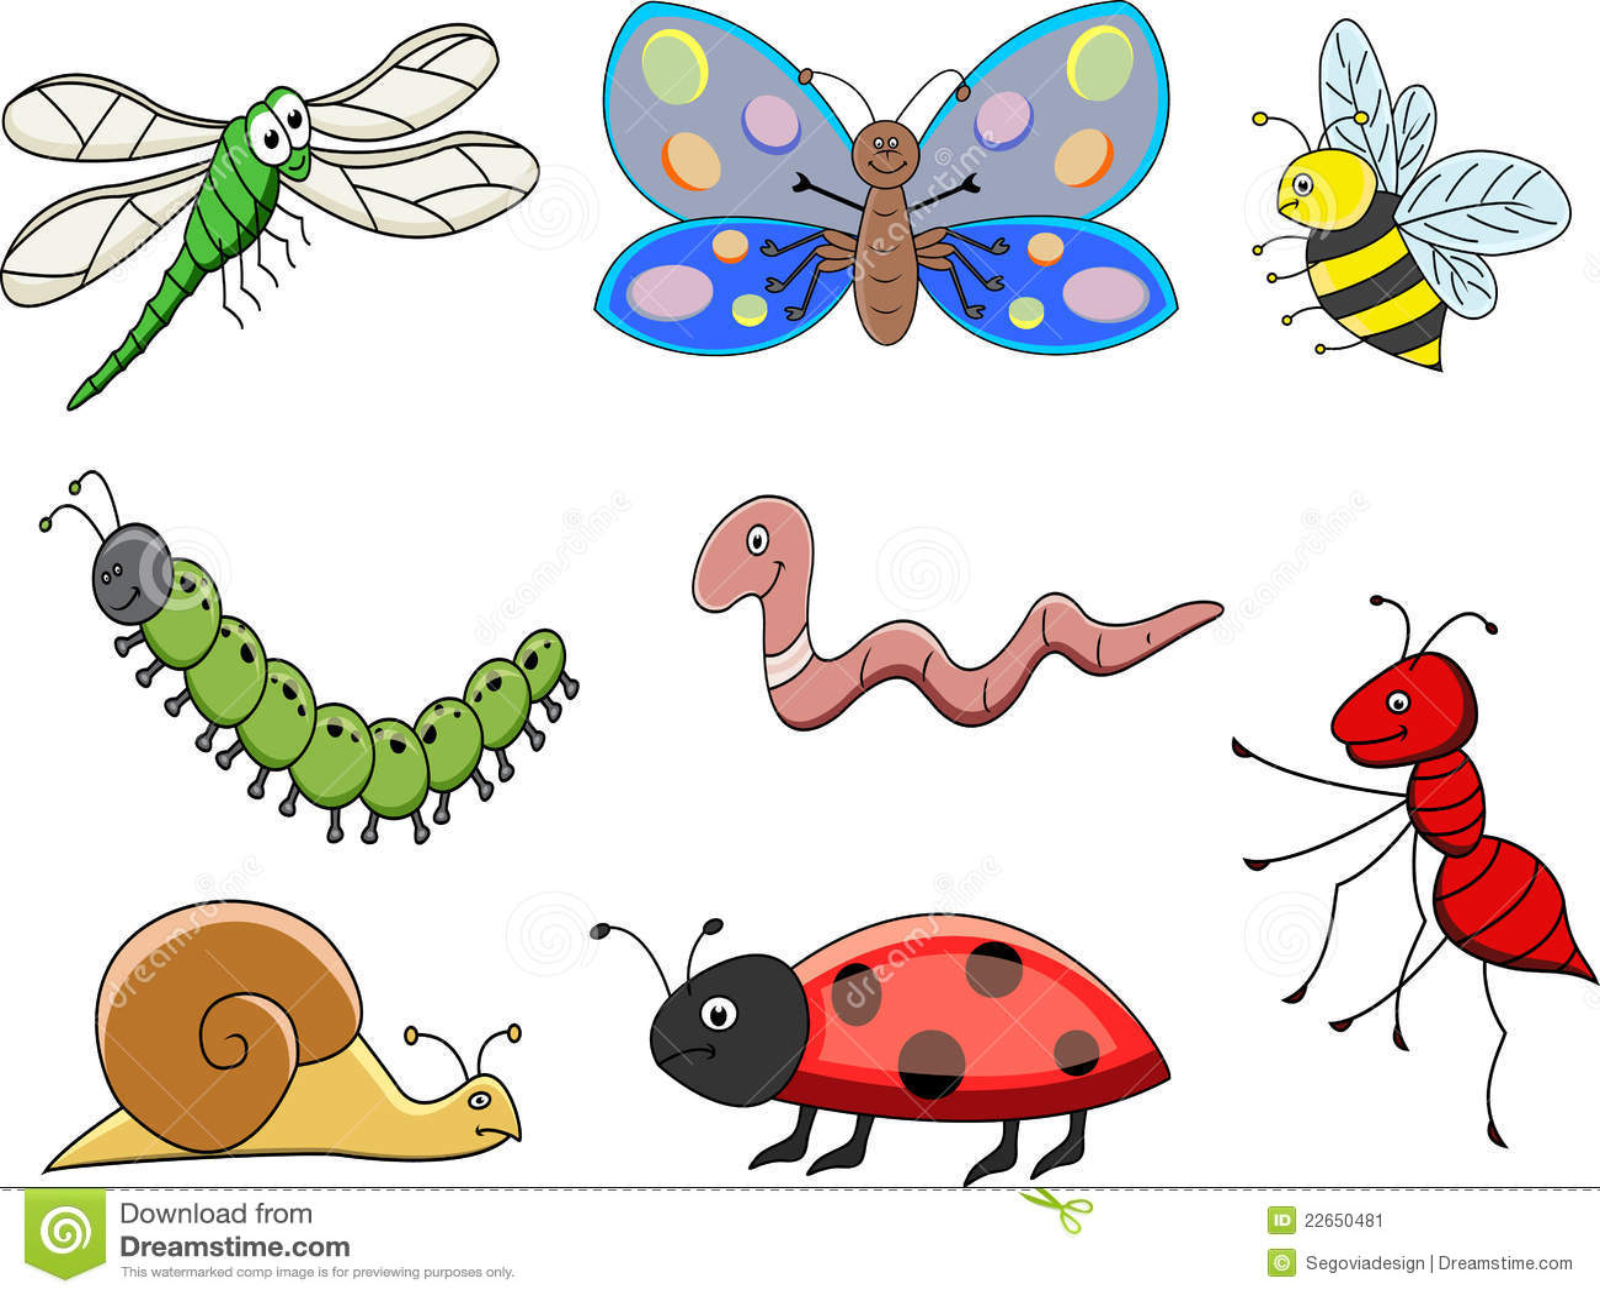 funny cartoon insect stock image image 22650481 Praying Mantis Drawing praying mantis clipart